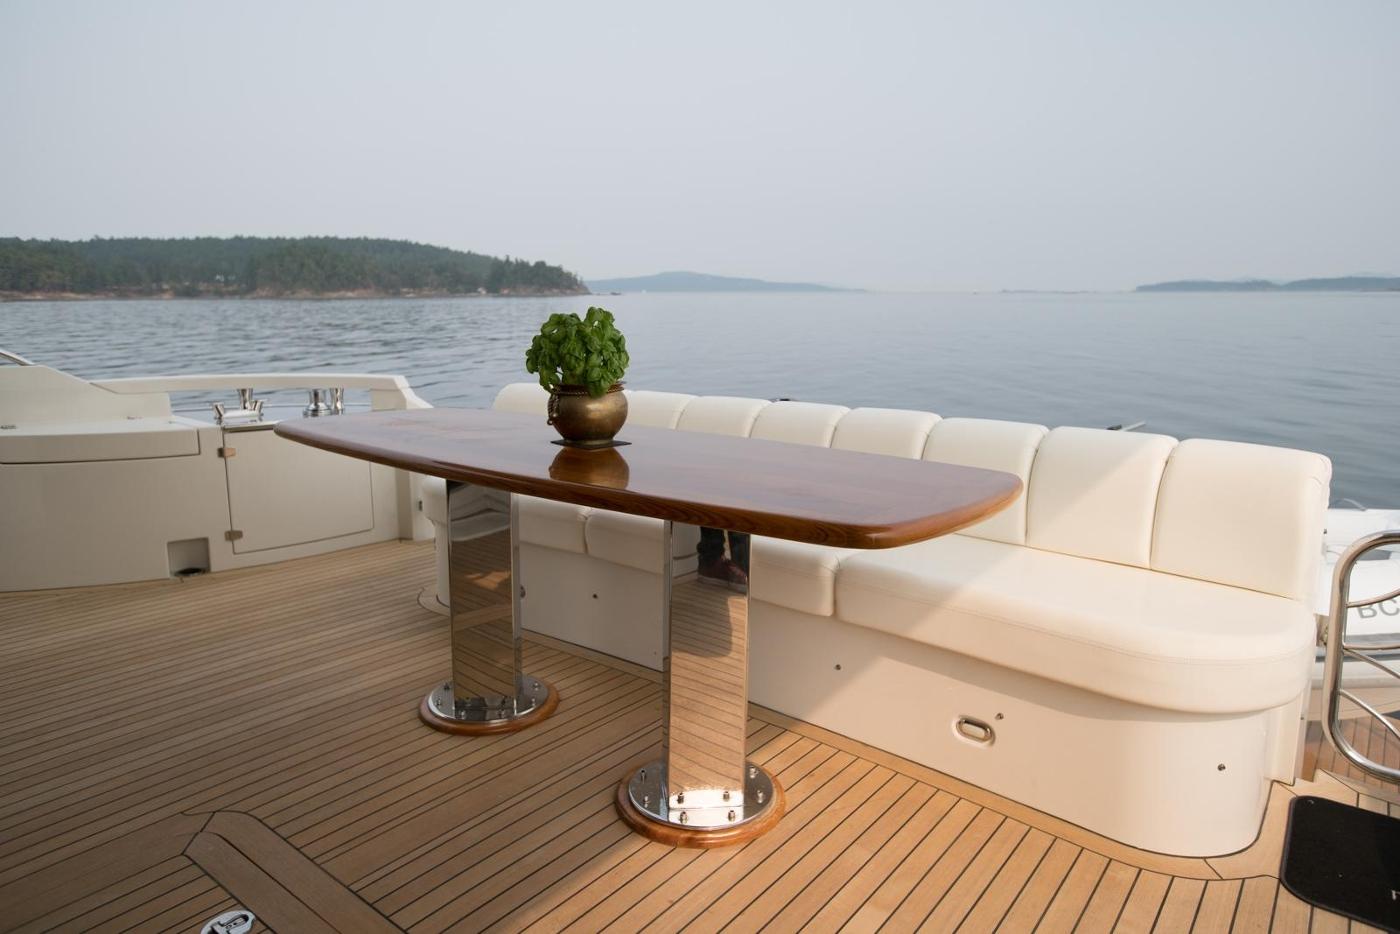 2006 Marquis Motor Yacht, Aft deck settee